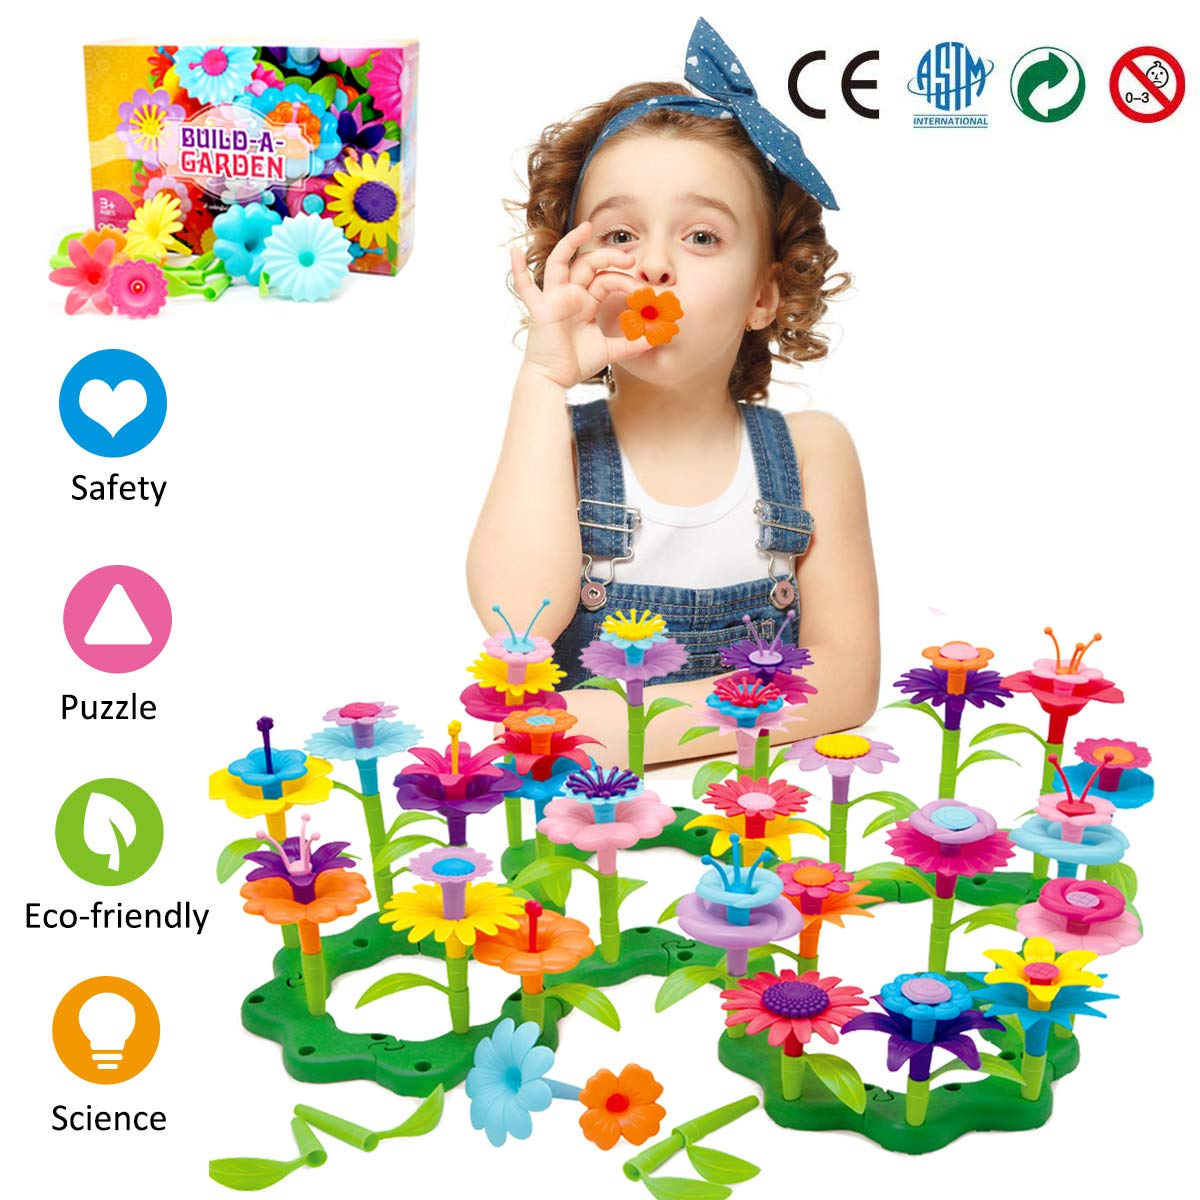 Binteng Flower Building Toys Set for Girl 98 Pcs Creative Preschool Educational Toys Garden Bouquet Blocks Playset Kids Christmas Birthday Gifts for 3 4 5 6 7 Year Old